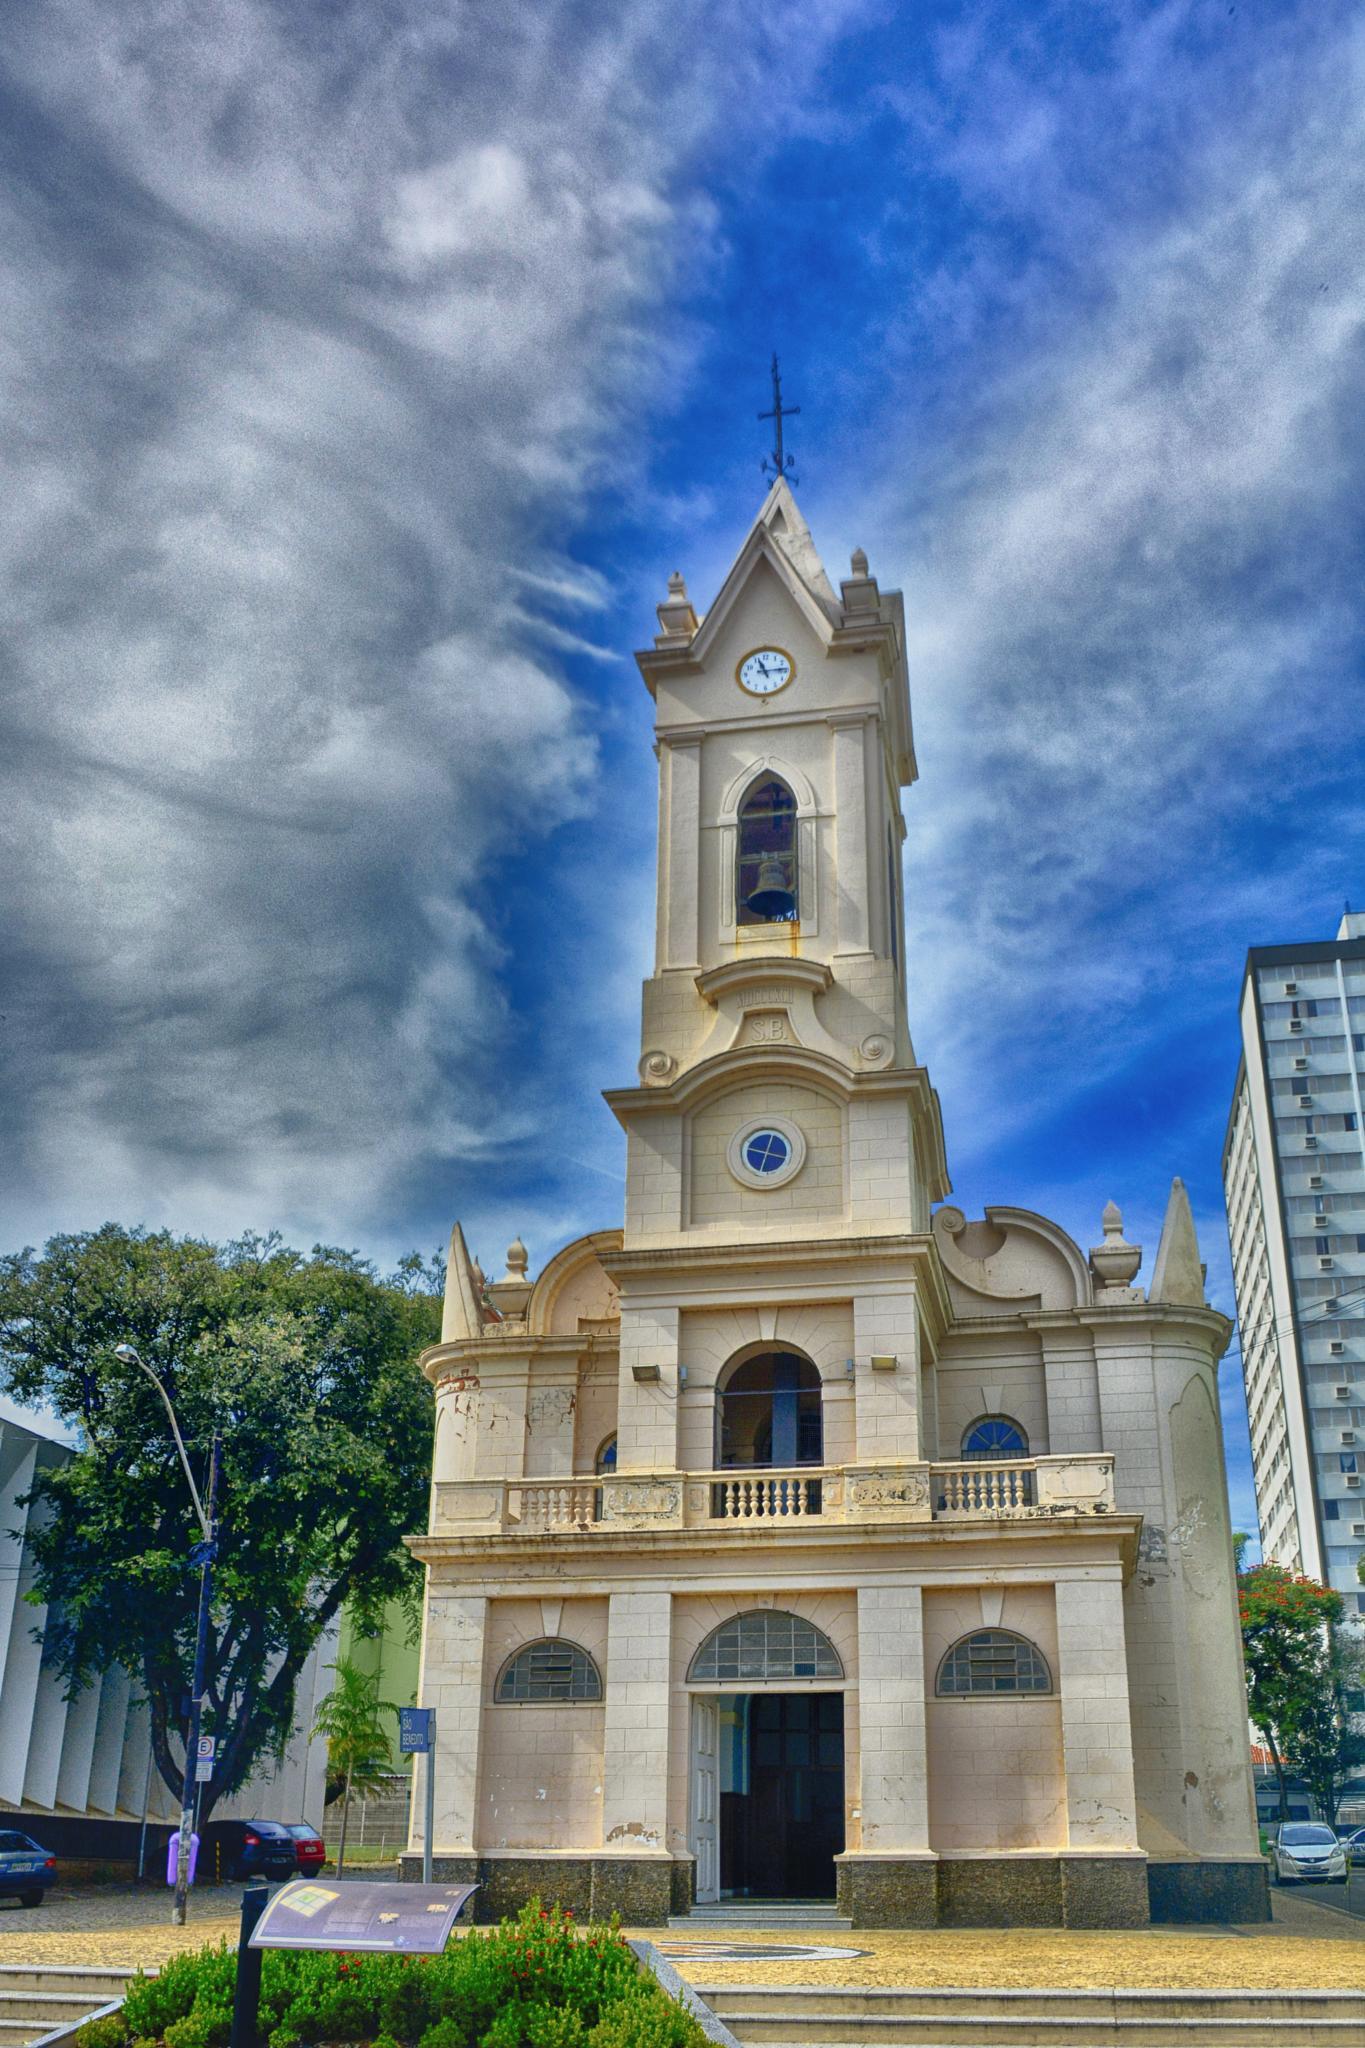 Igreja/Church/Iglesia by Jose Liborio